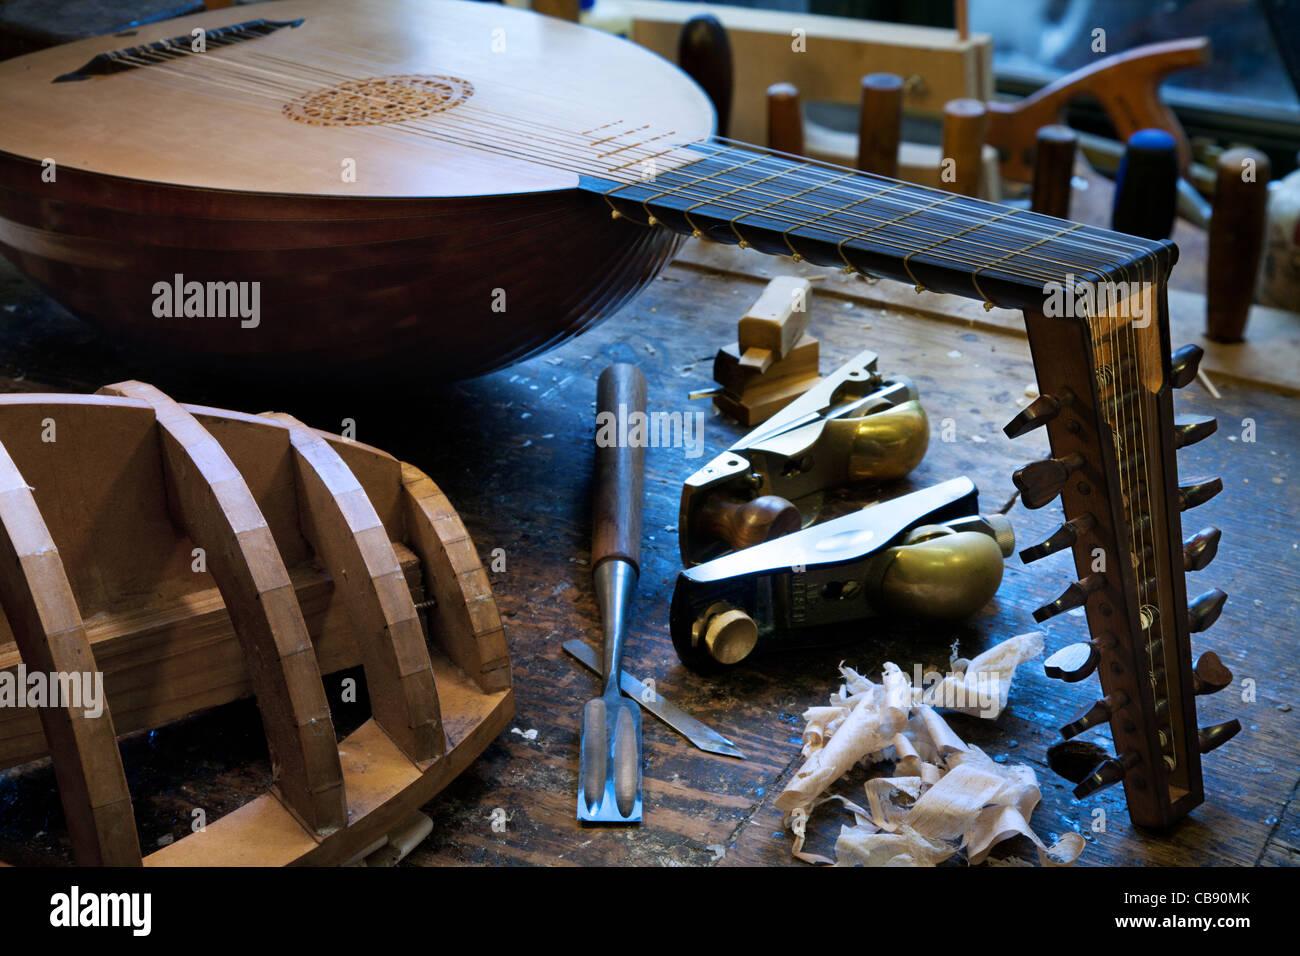 Werkzeuge in eine laute Maker-Werkstatt Stockbild